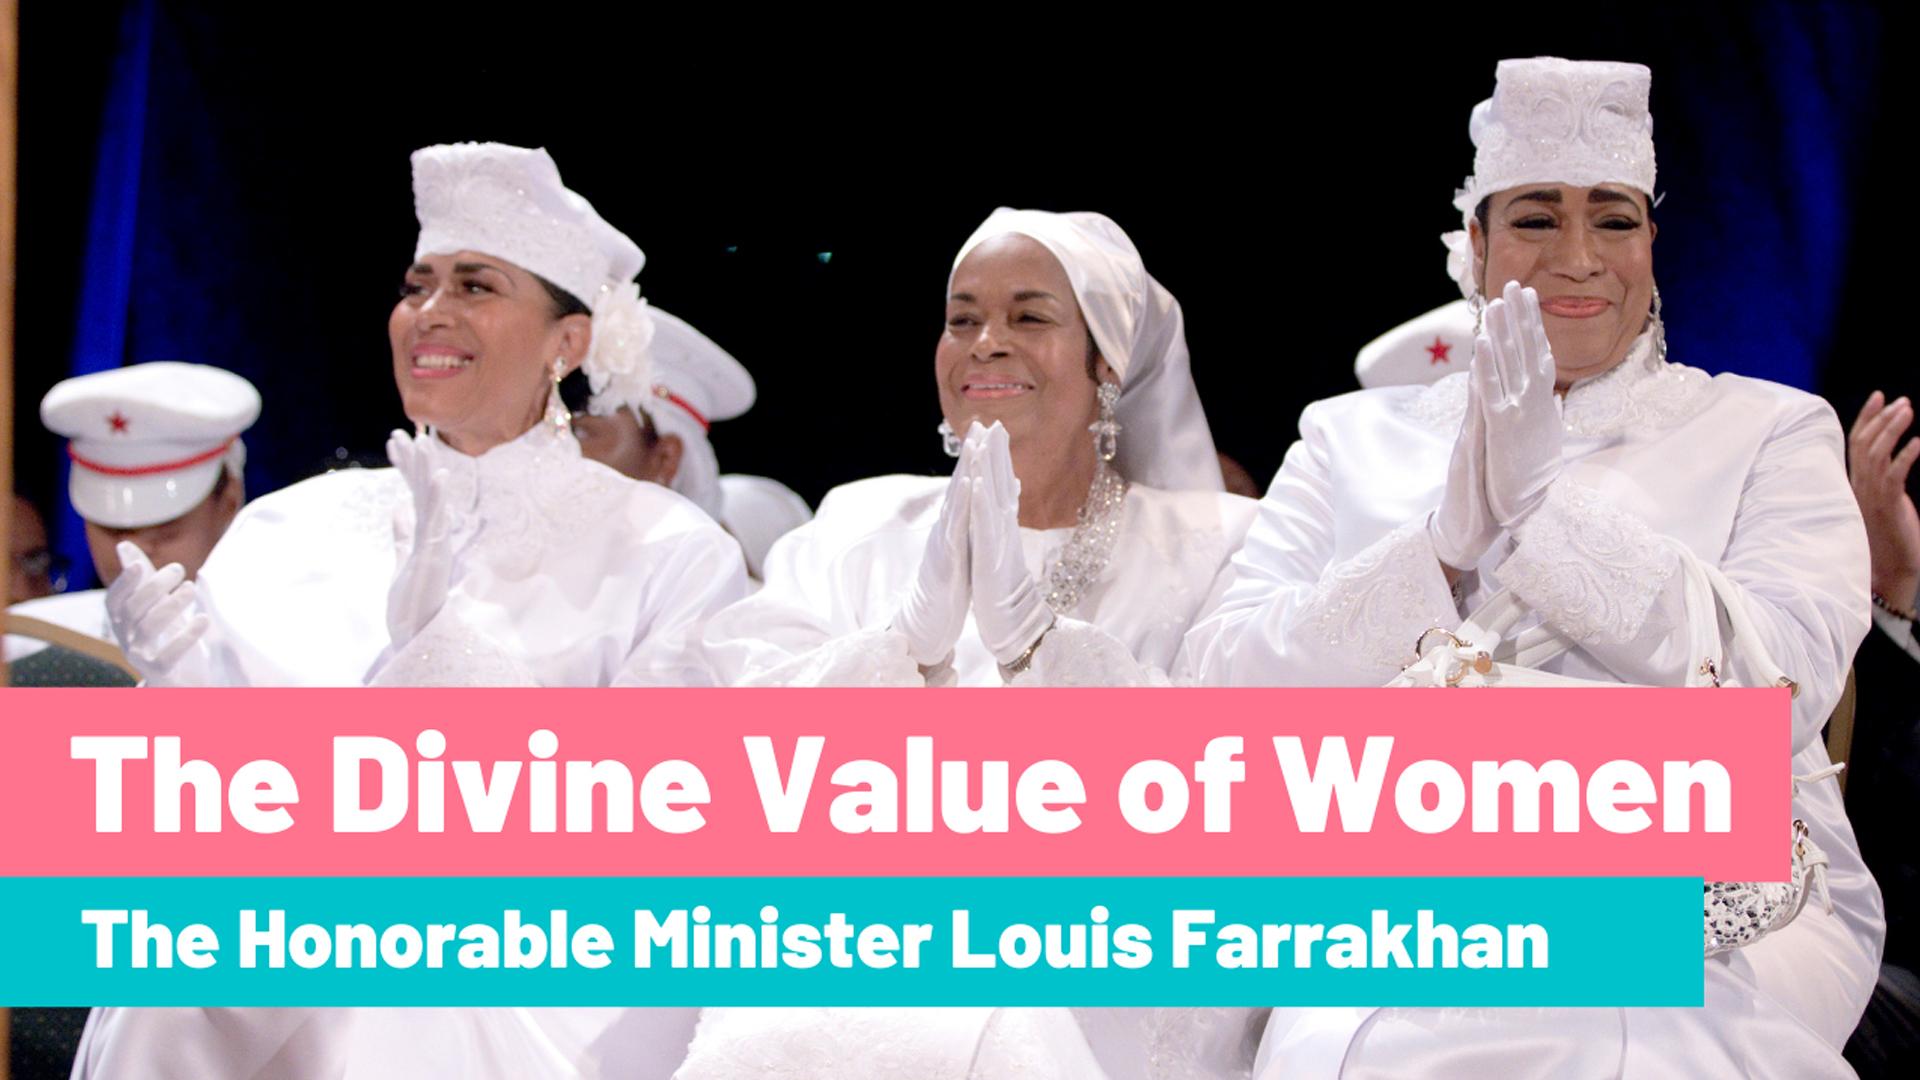 The Divine Value of Women